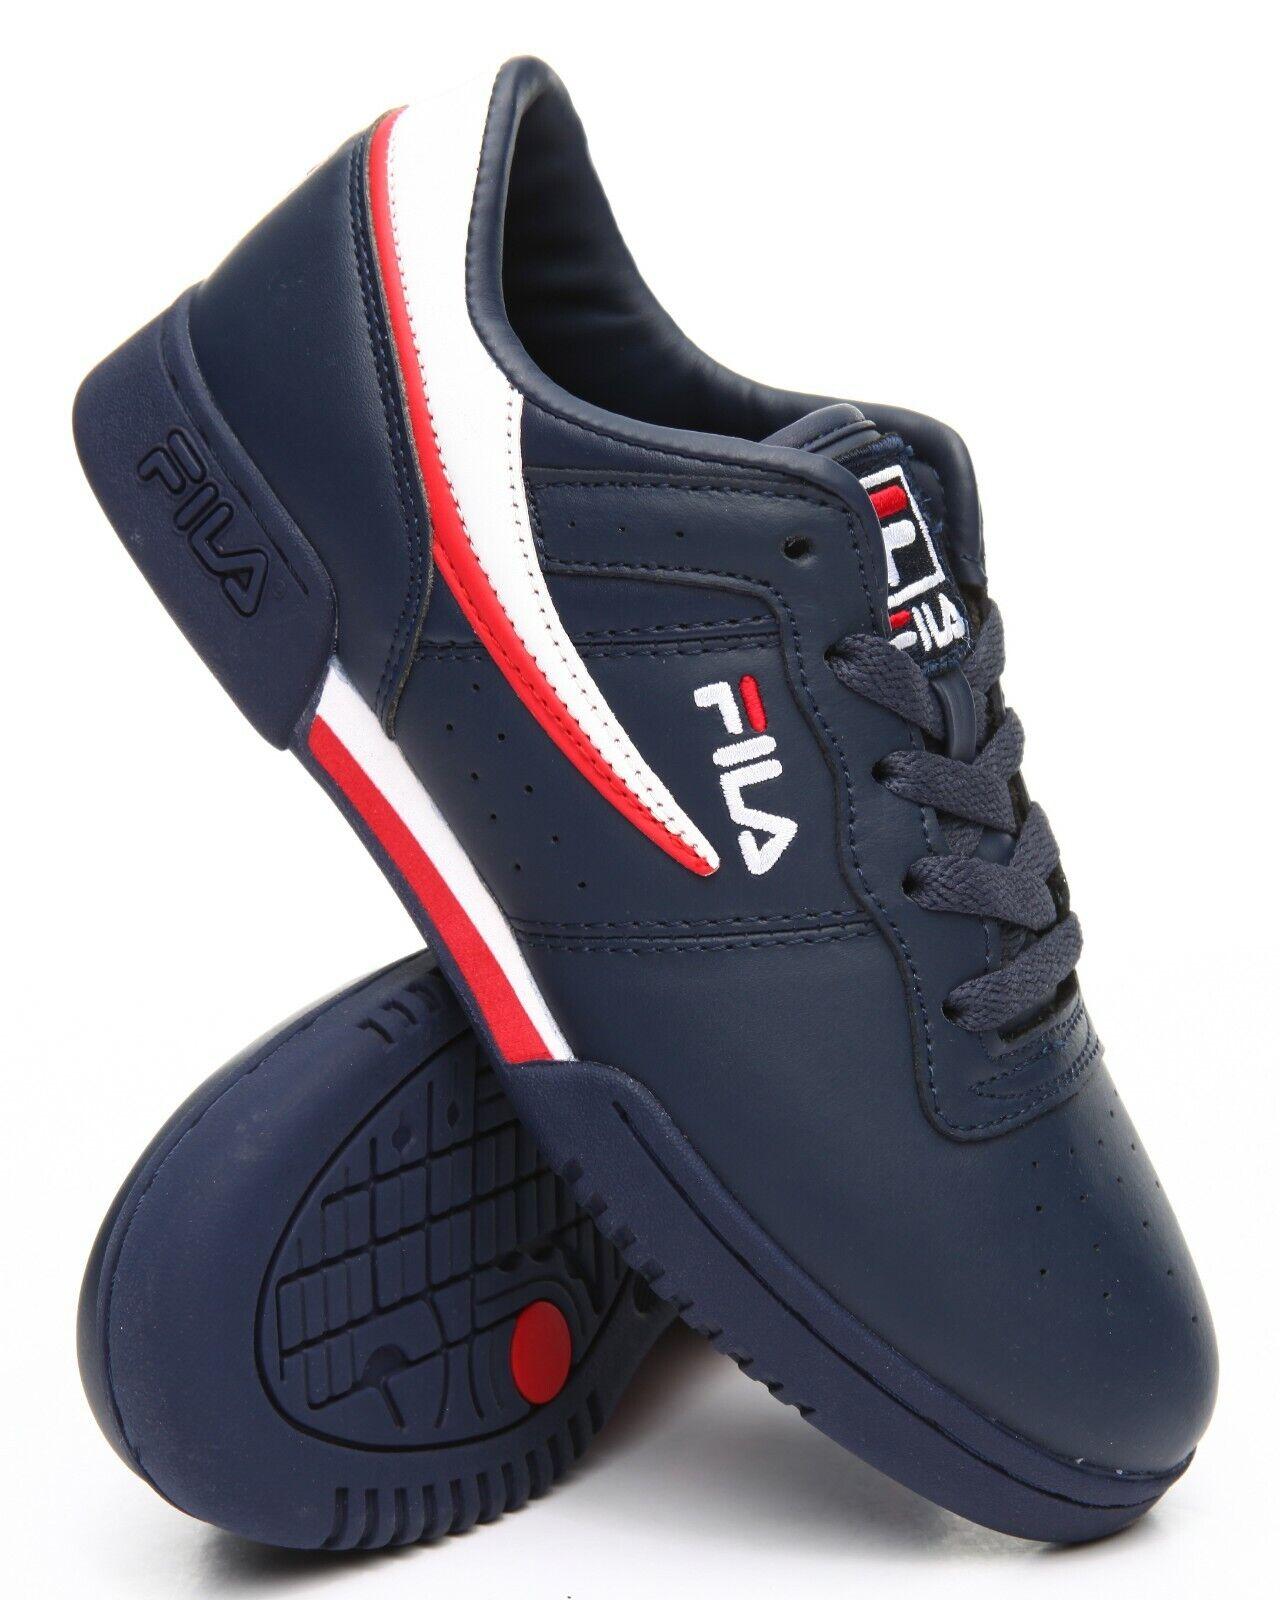 Fila Original Fitness Navy Blue White Red Mens Sneakers Tenn